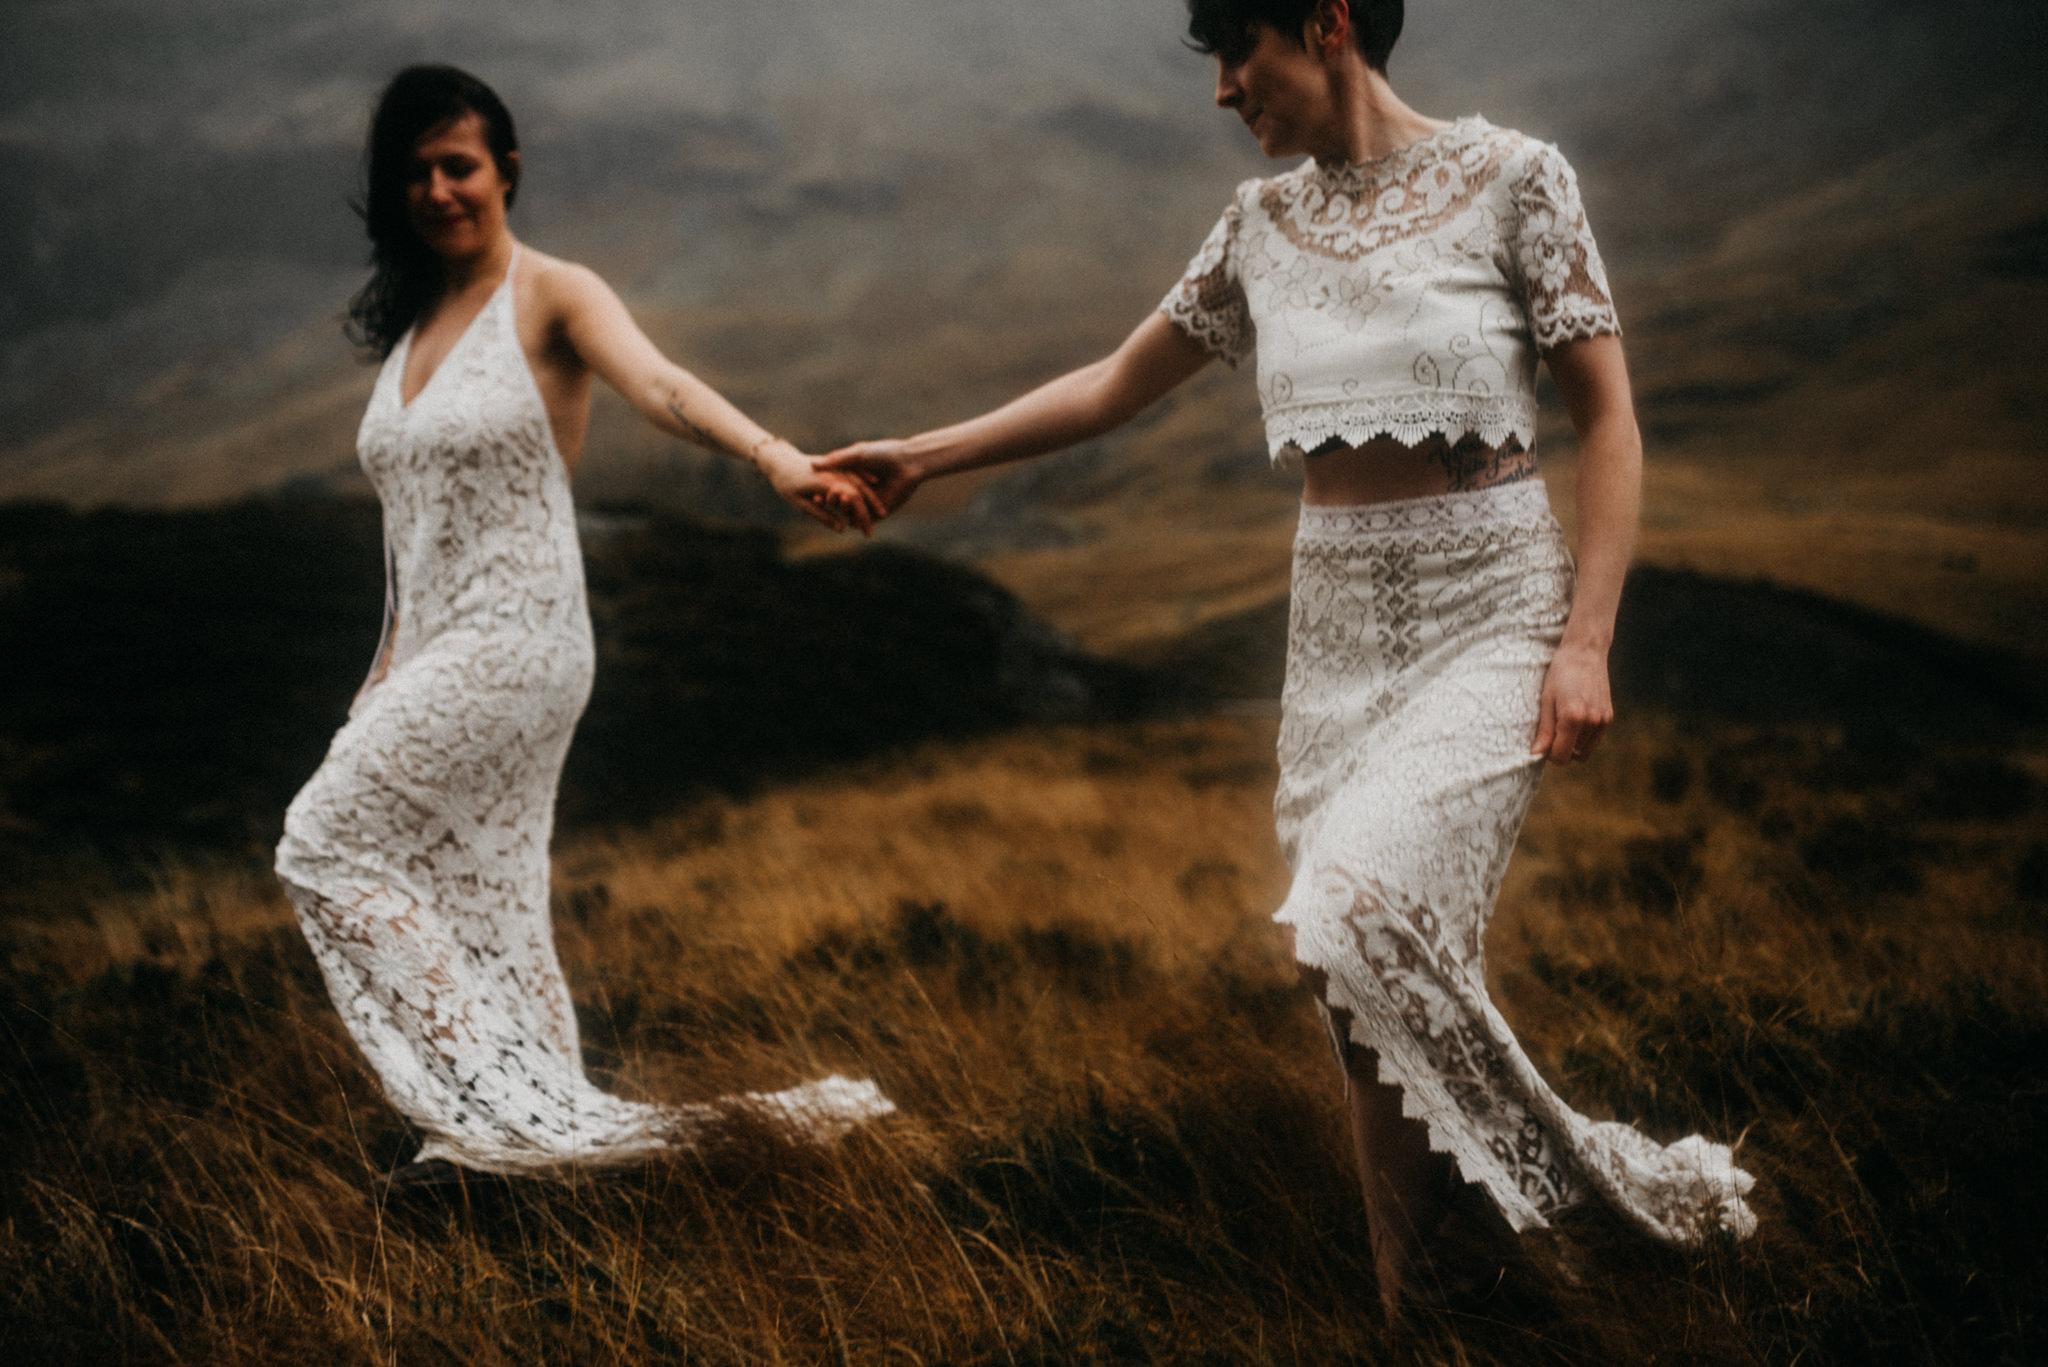 twyla jones photography - scotland glencoe moody same sex elopement brides -24.jpg